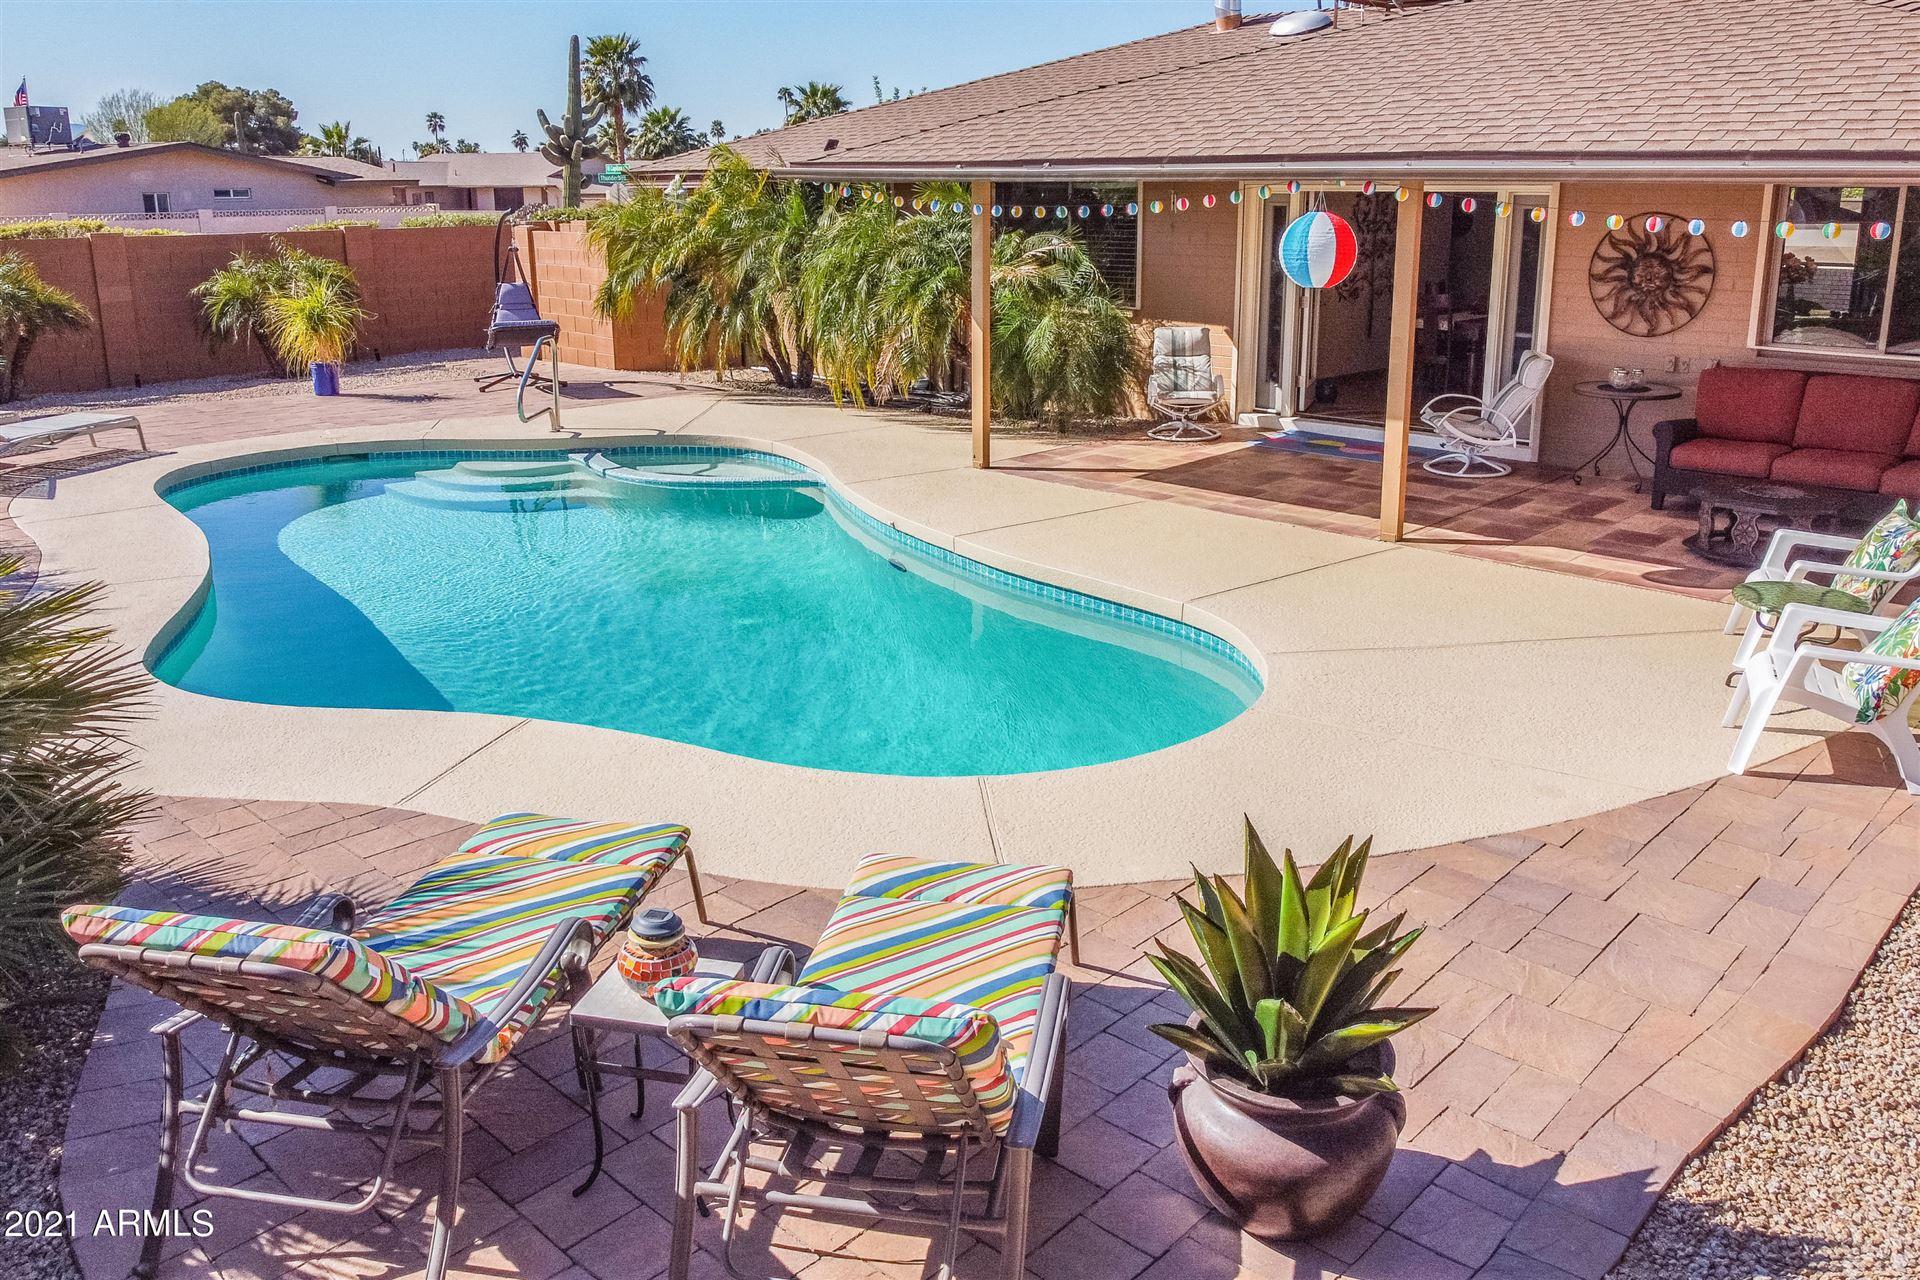 10817 W El Capitan Circle Sun City Az 85351 Mls 6208995 Listing Information Vylla Home